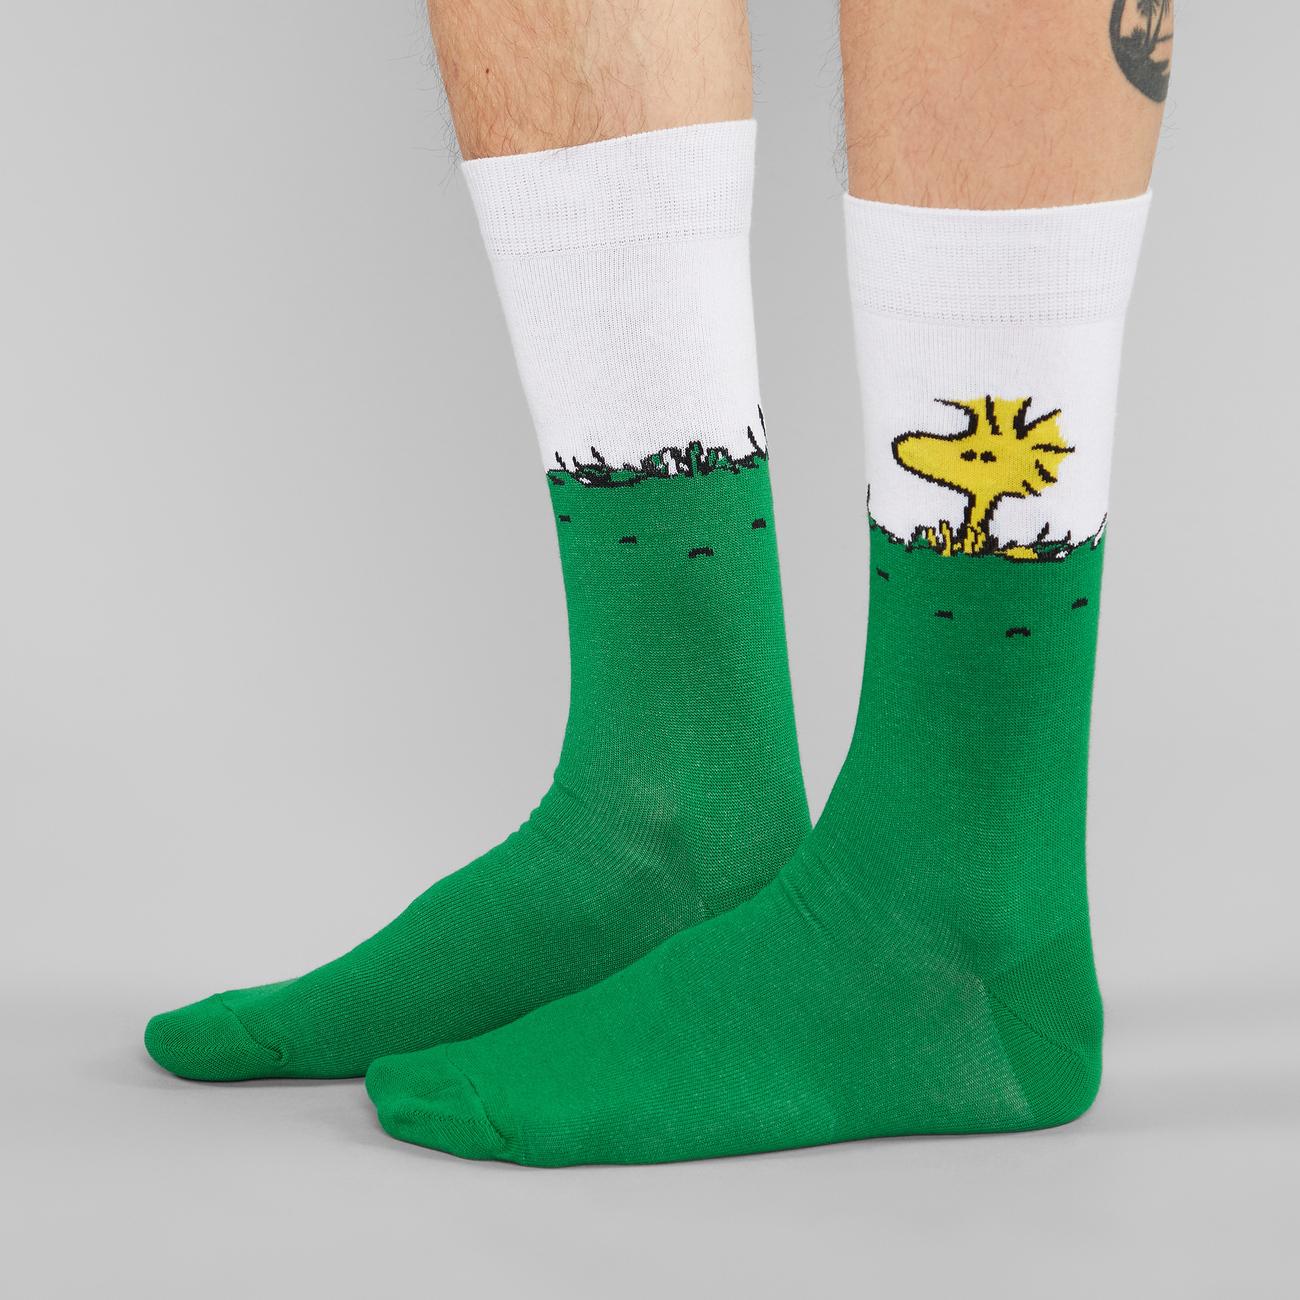 Socks Sigtuna Woodstock Green